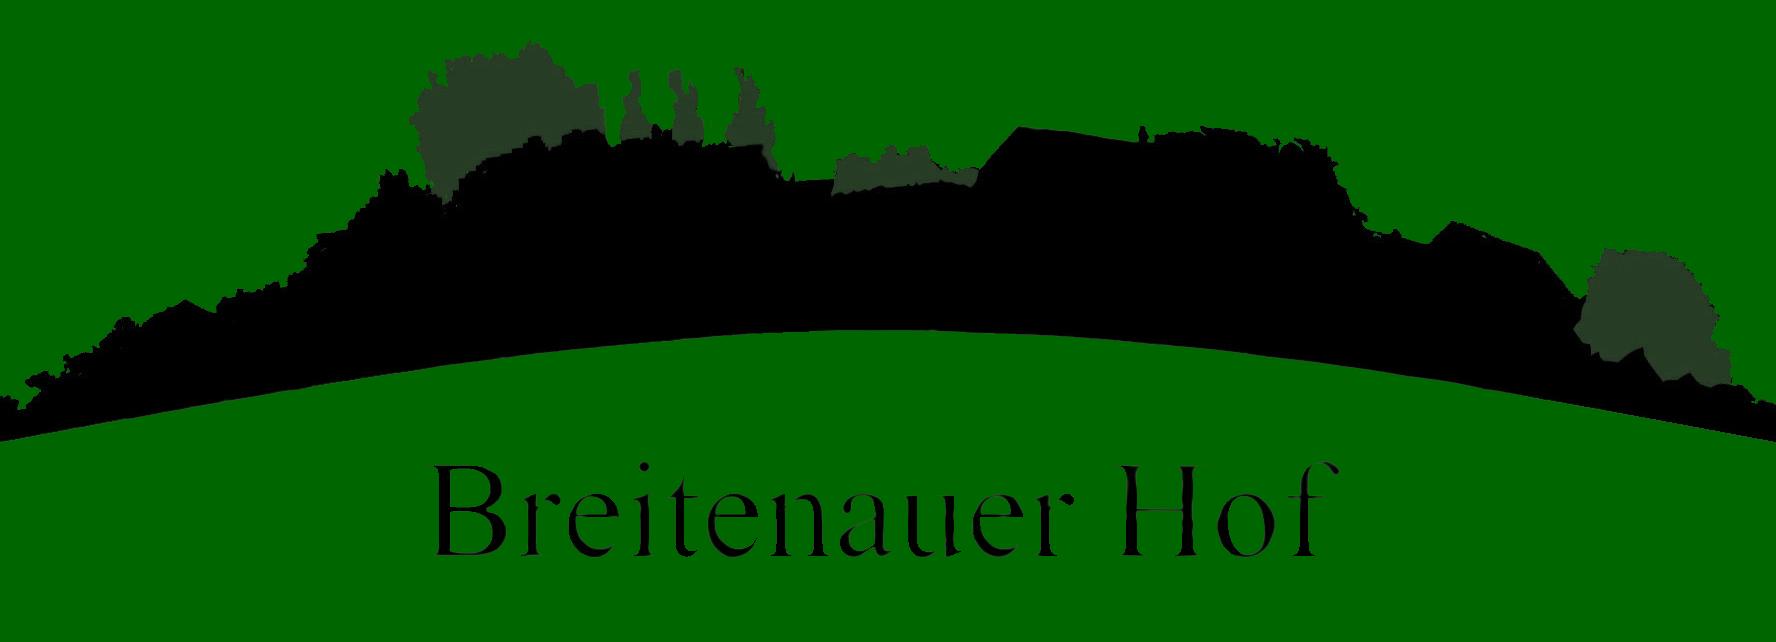 Logo Schrift unterhalb Transparent grün